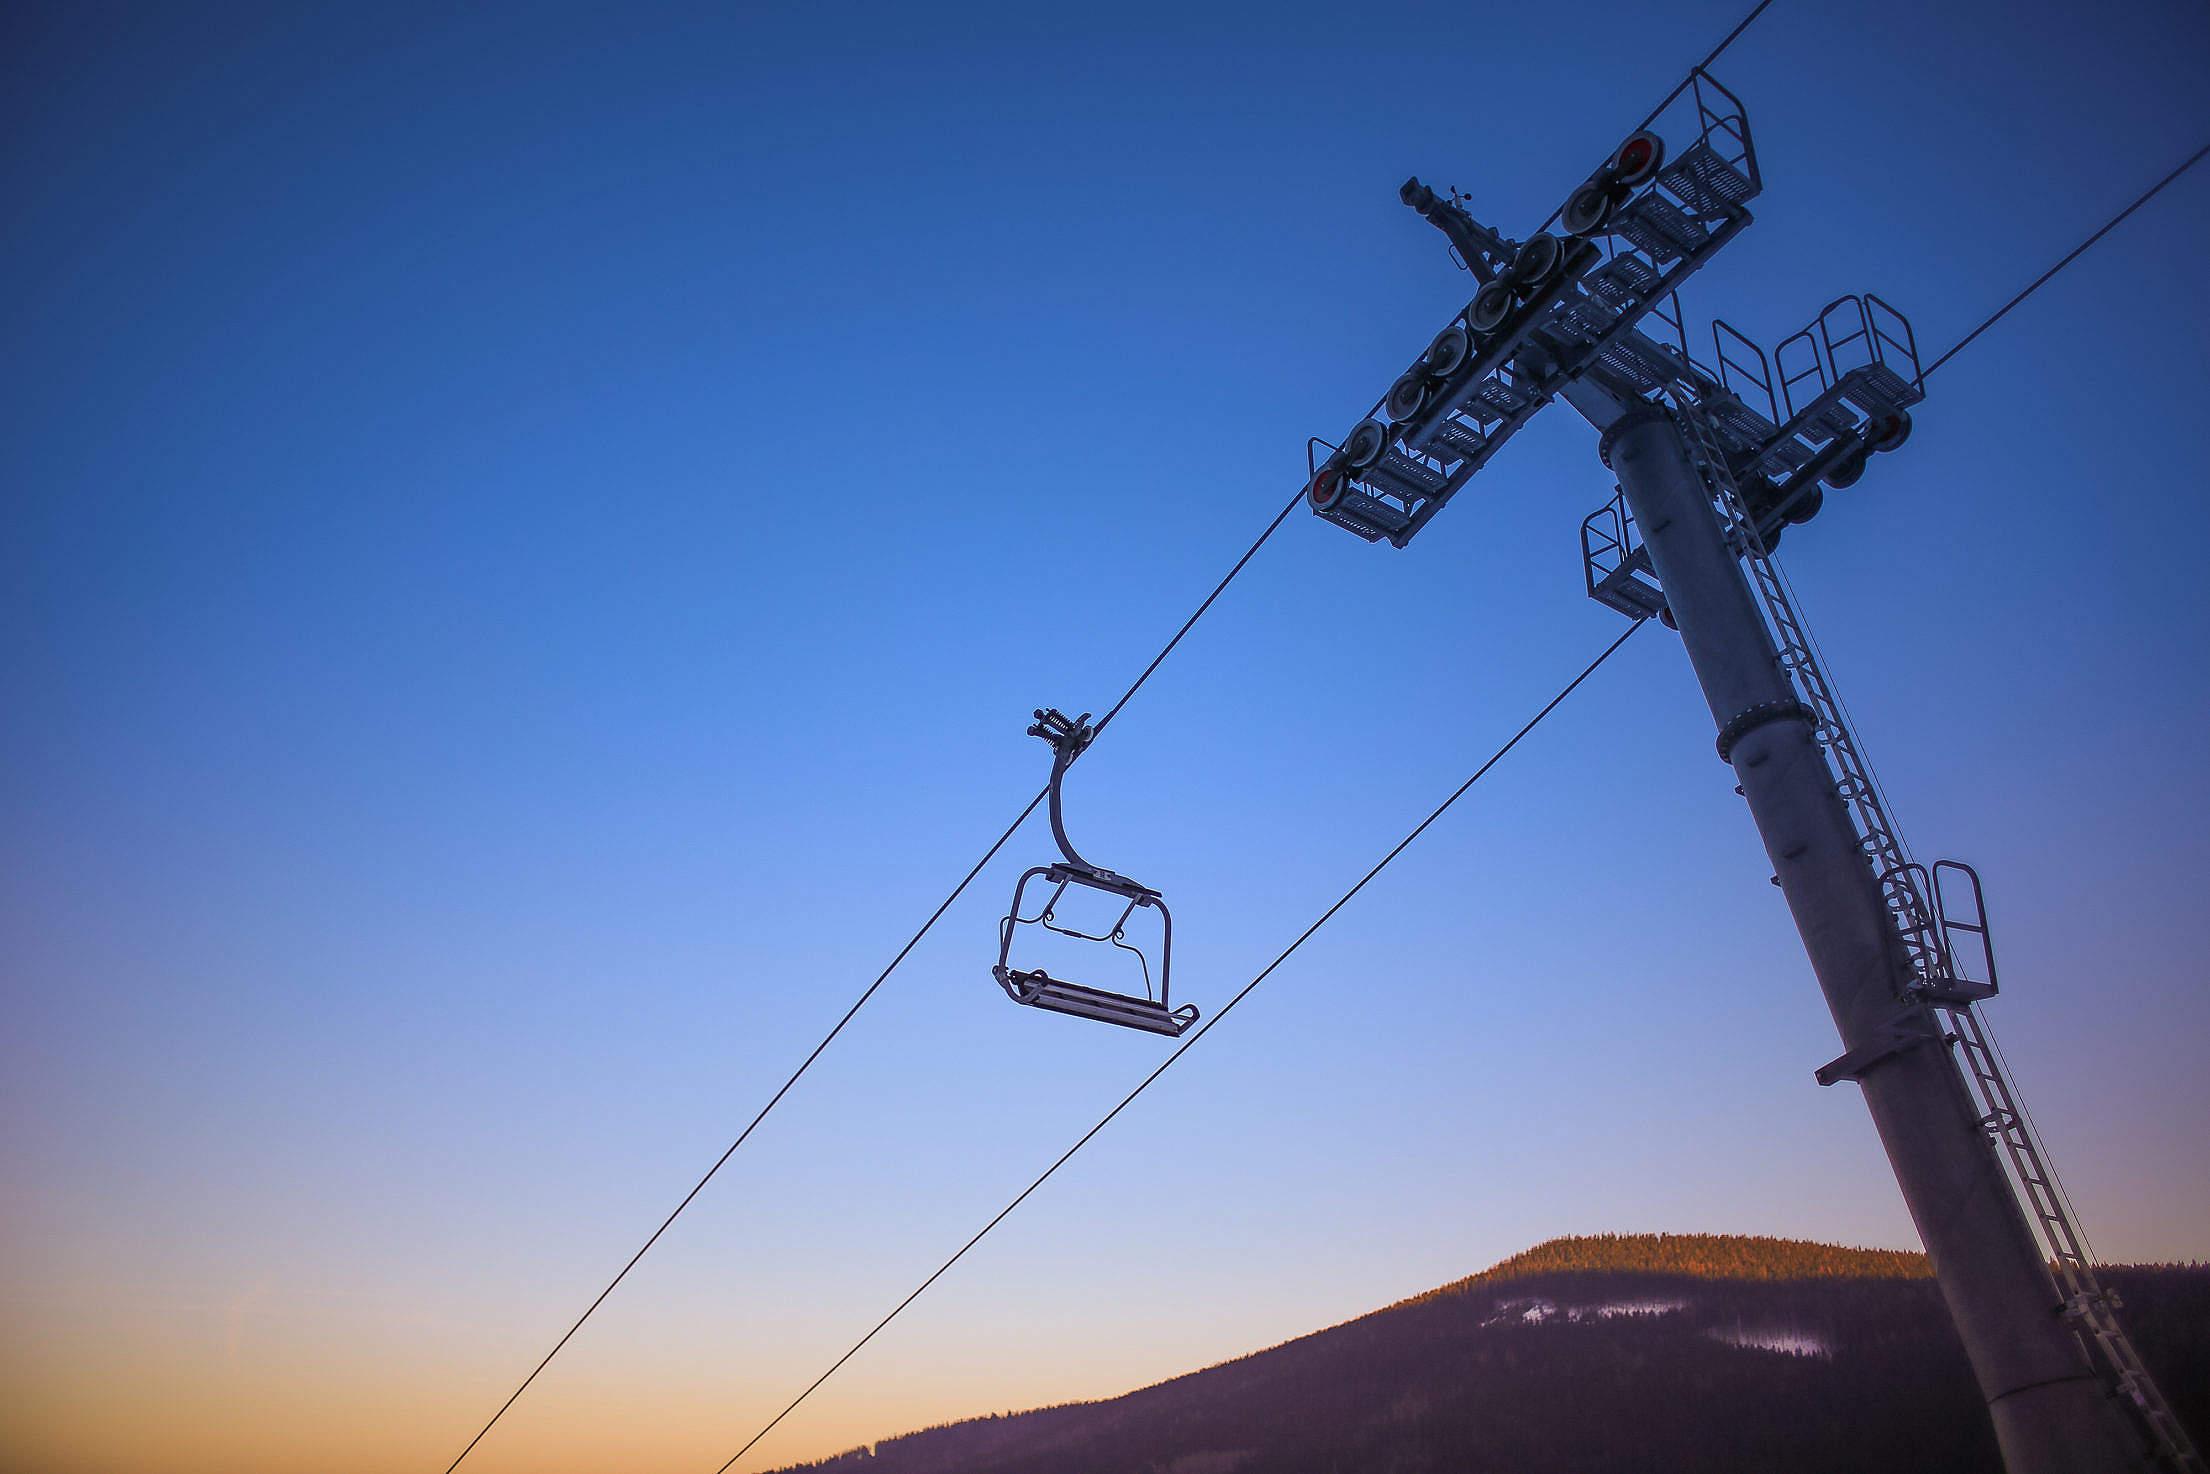 Sunset Ski Lift Free Stock Photo